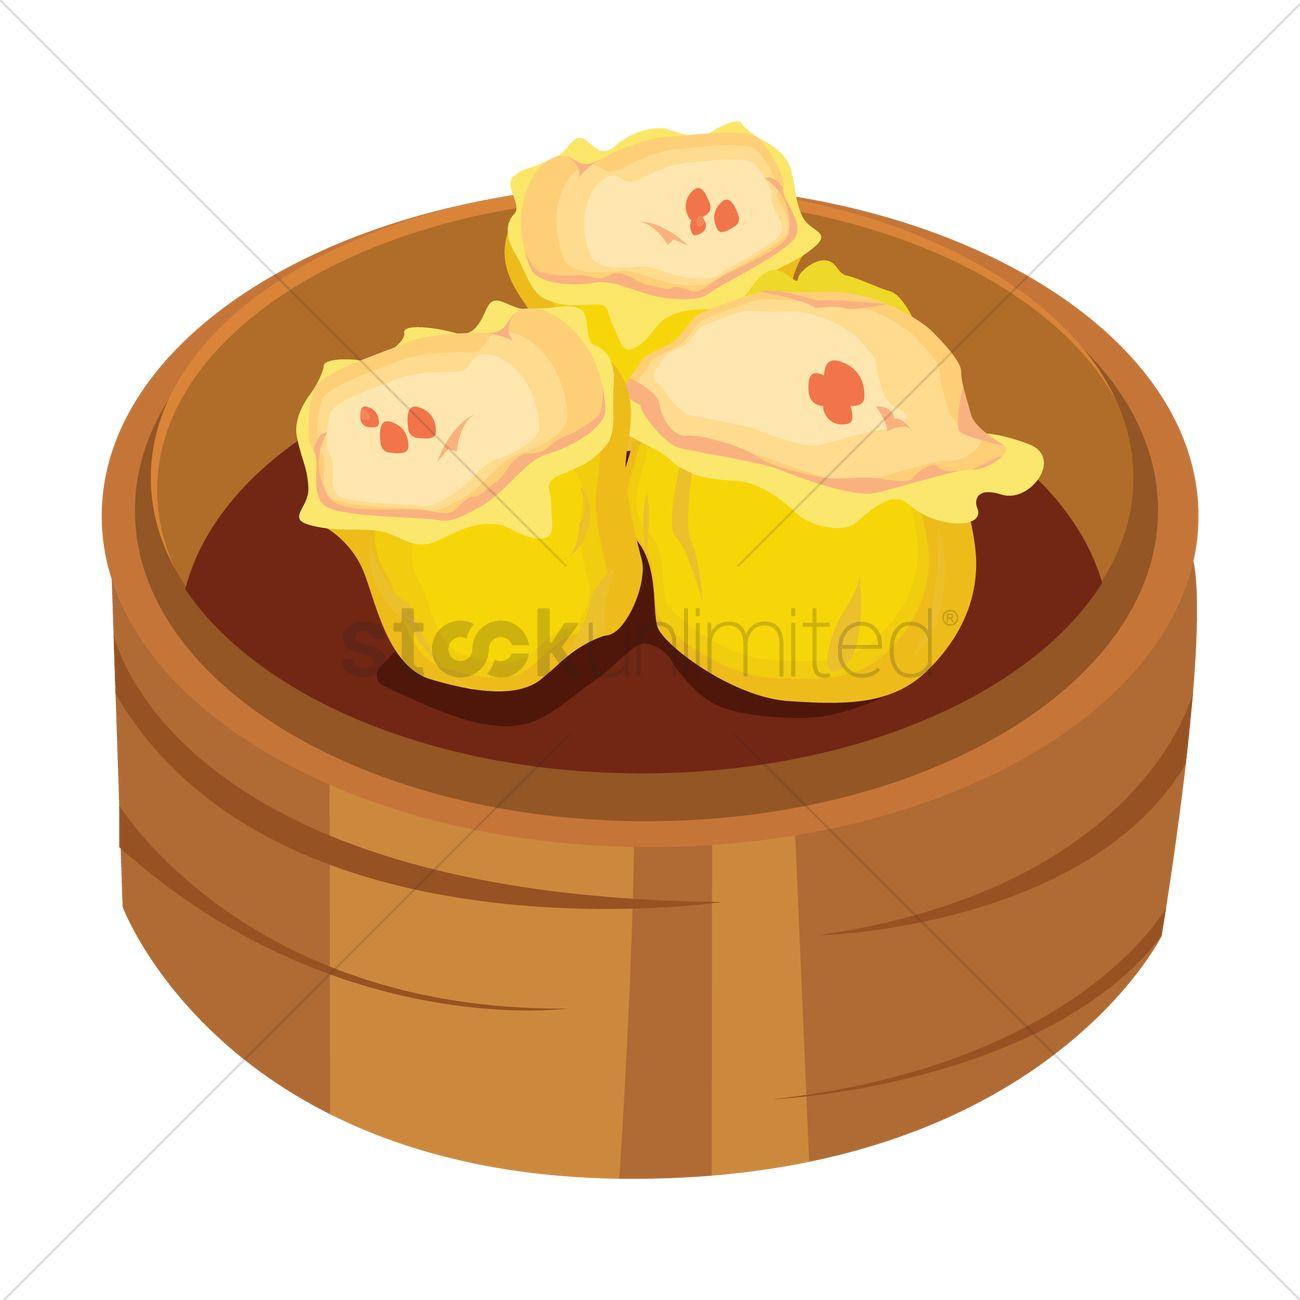 Pork dumplings Vector Image.